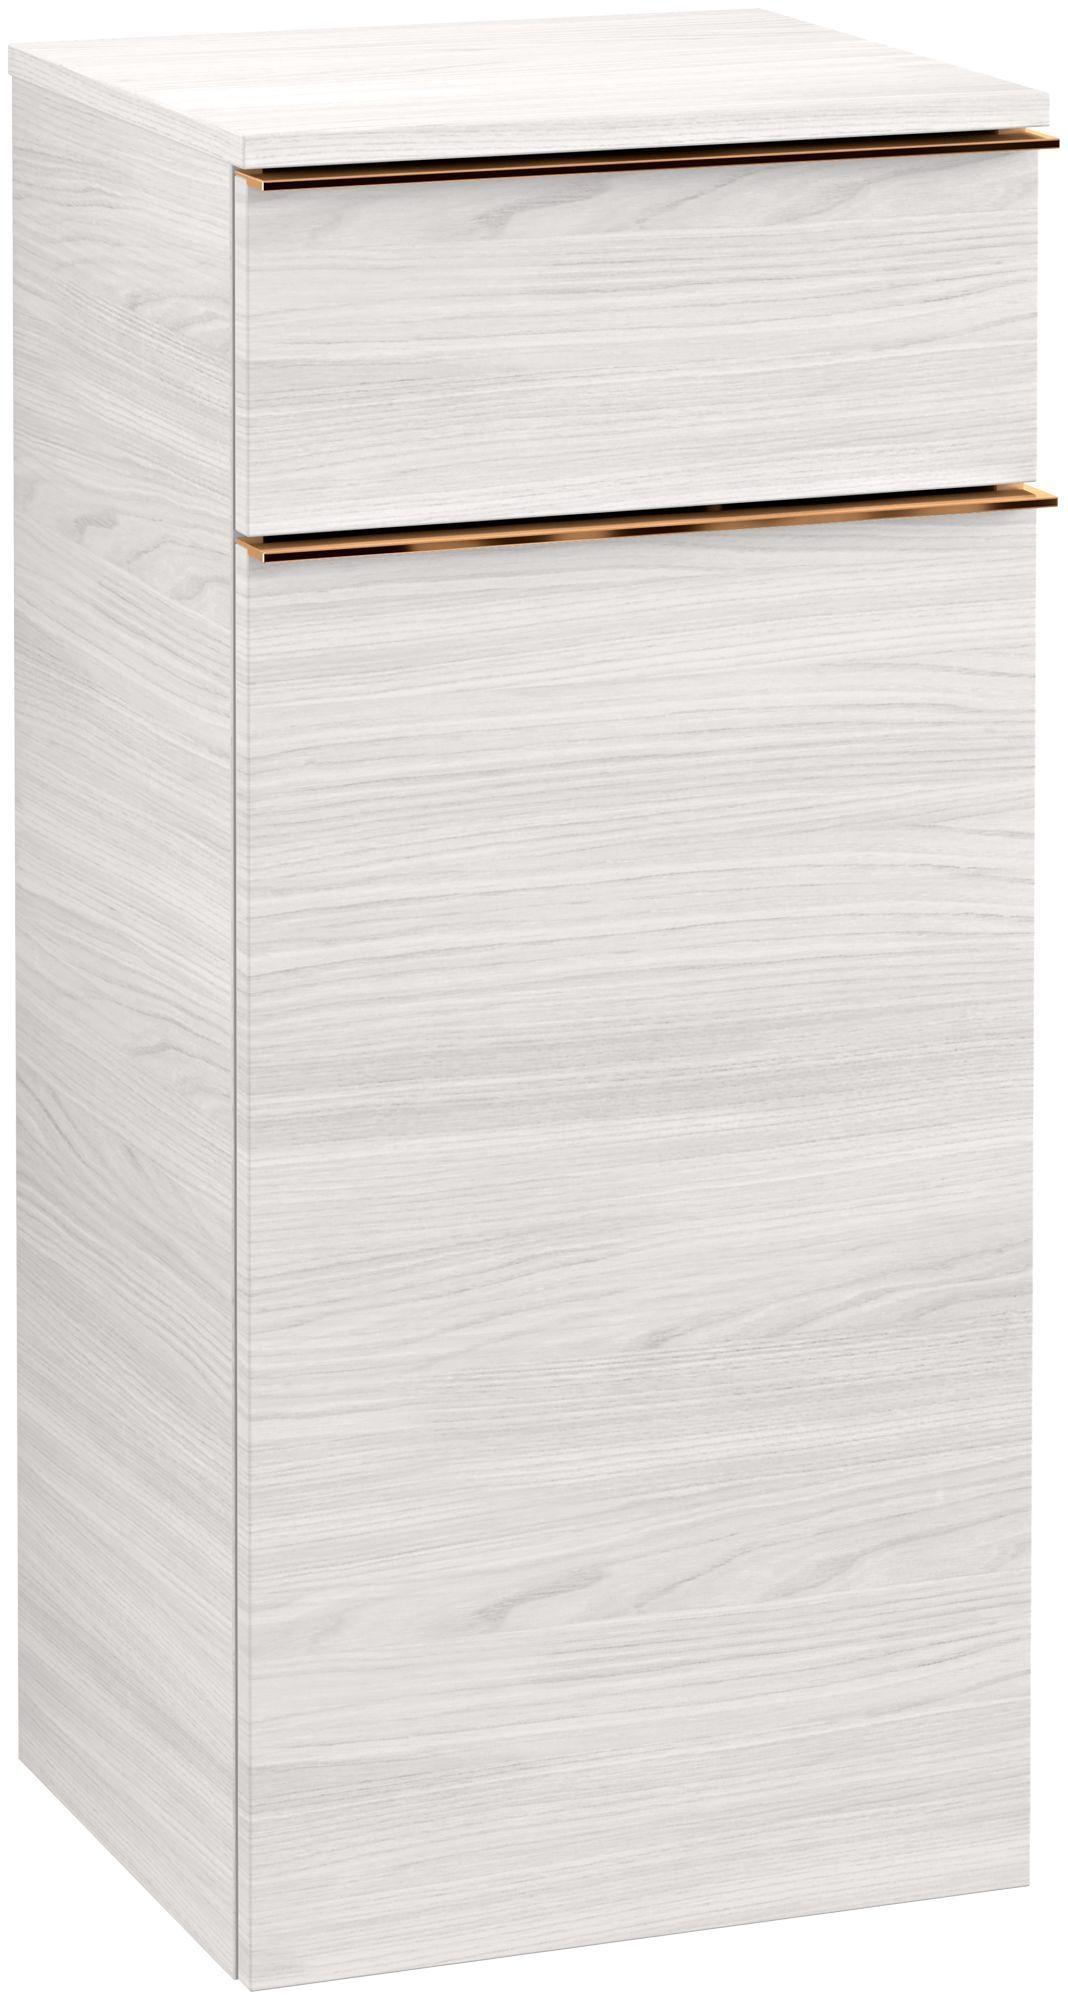 Villeroy & Boch Venticello Seitenschrank 1 Schublade 1 Tür Anschlag rechts B:40,4xH:86,6xT:37,2cm white wood Griffe copper A95015E8